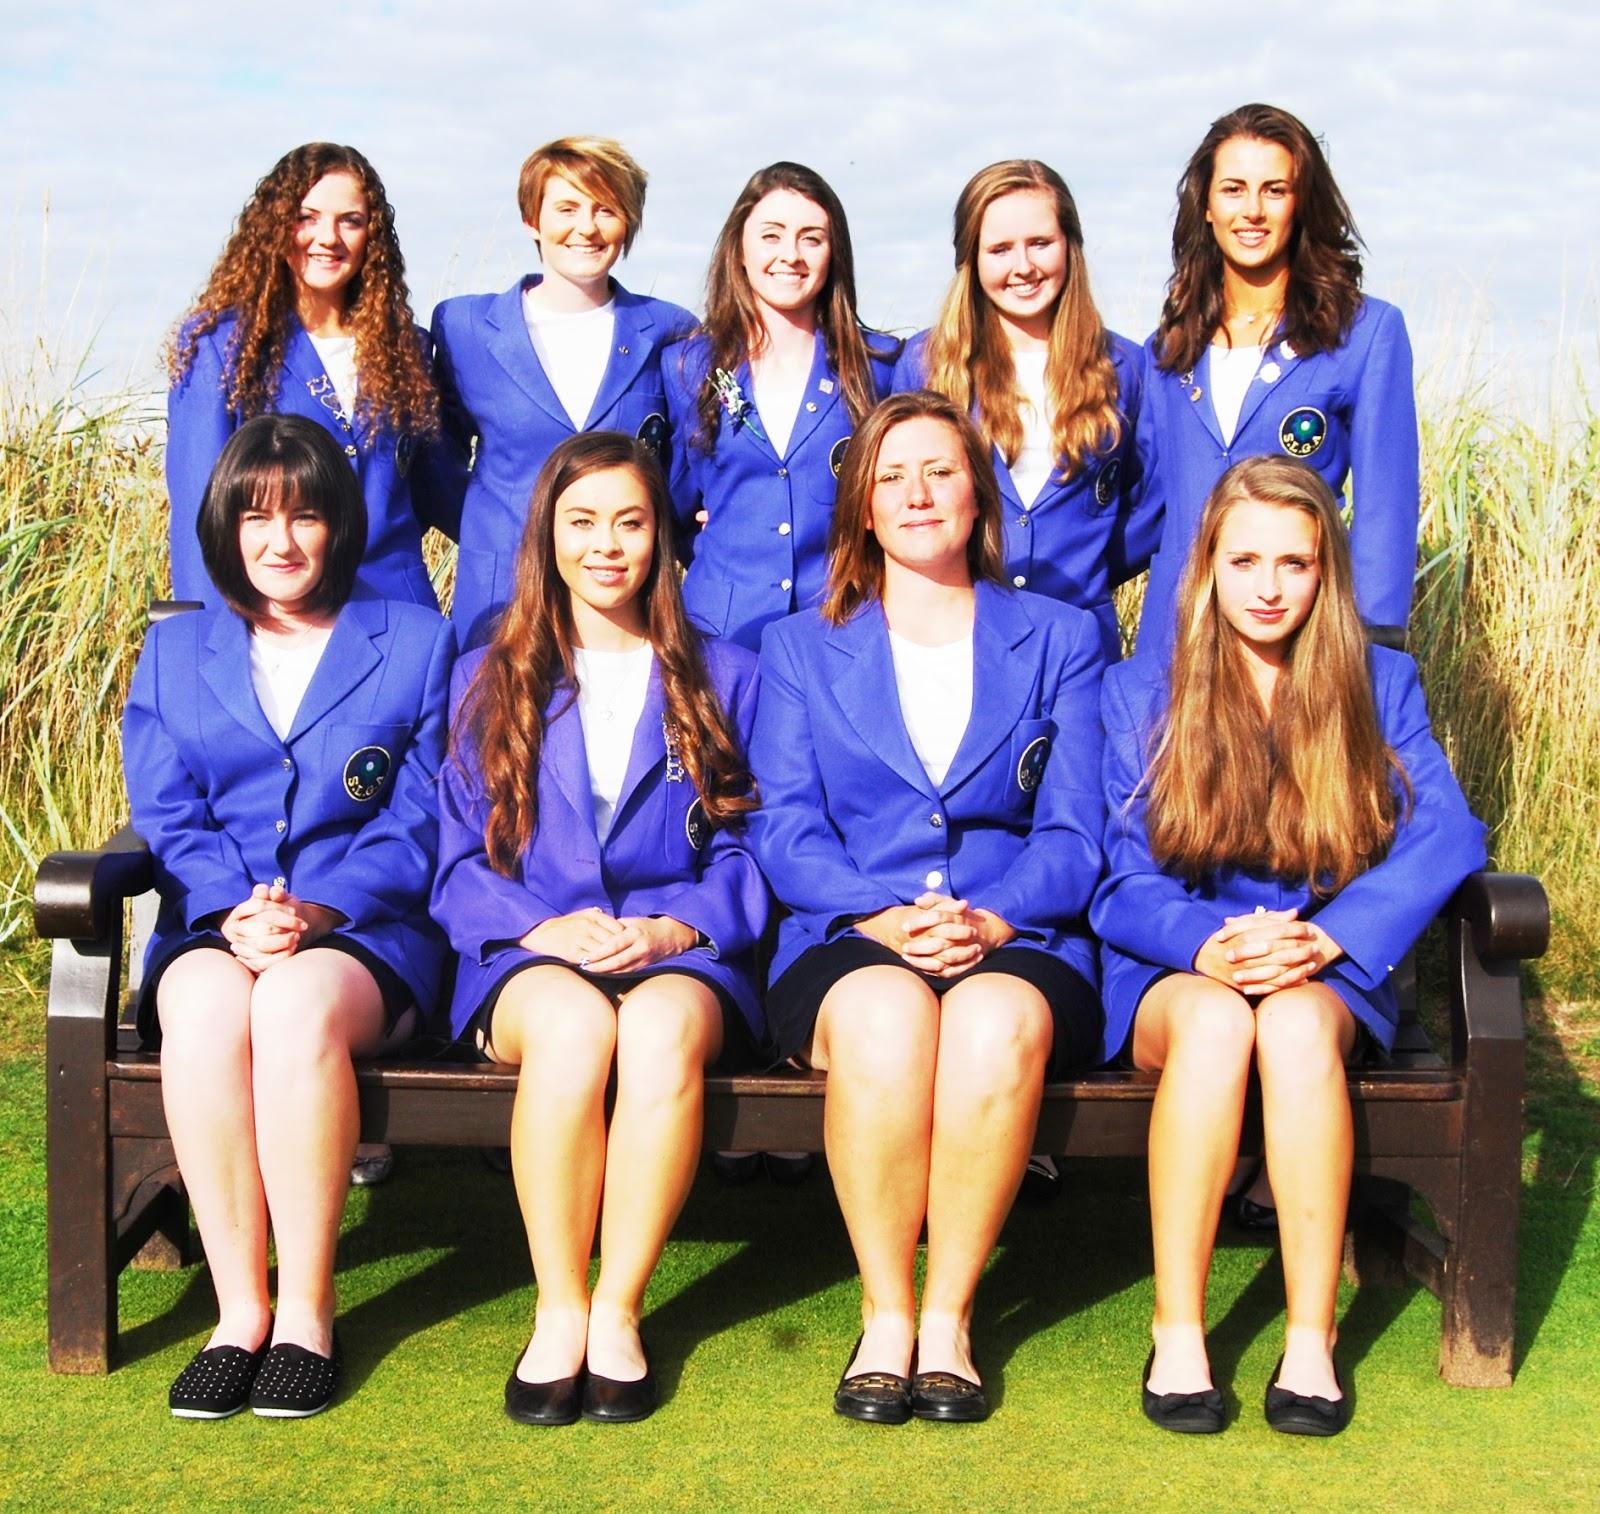 Girls of scotland